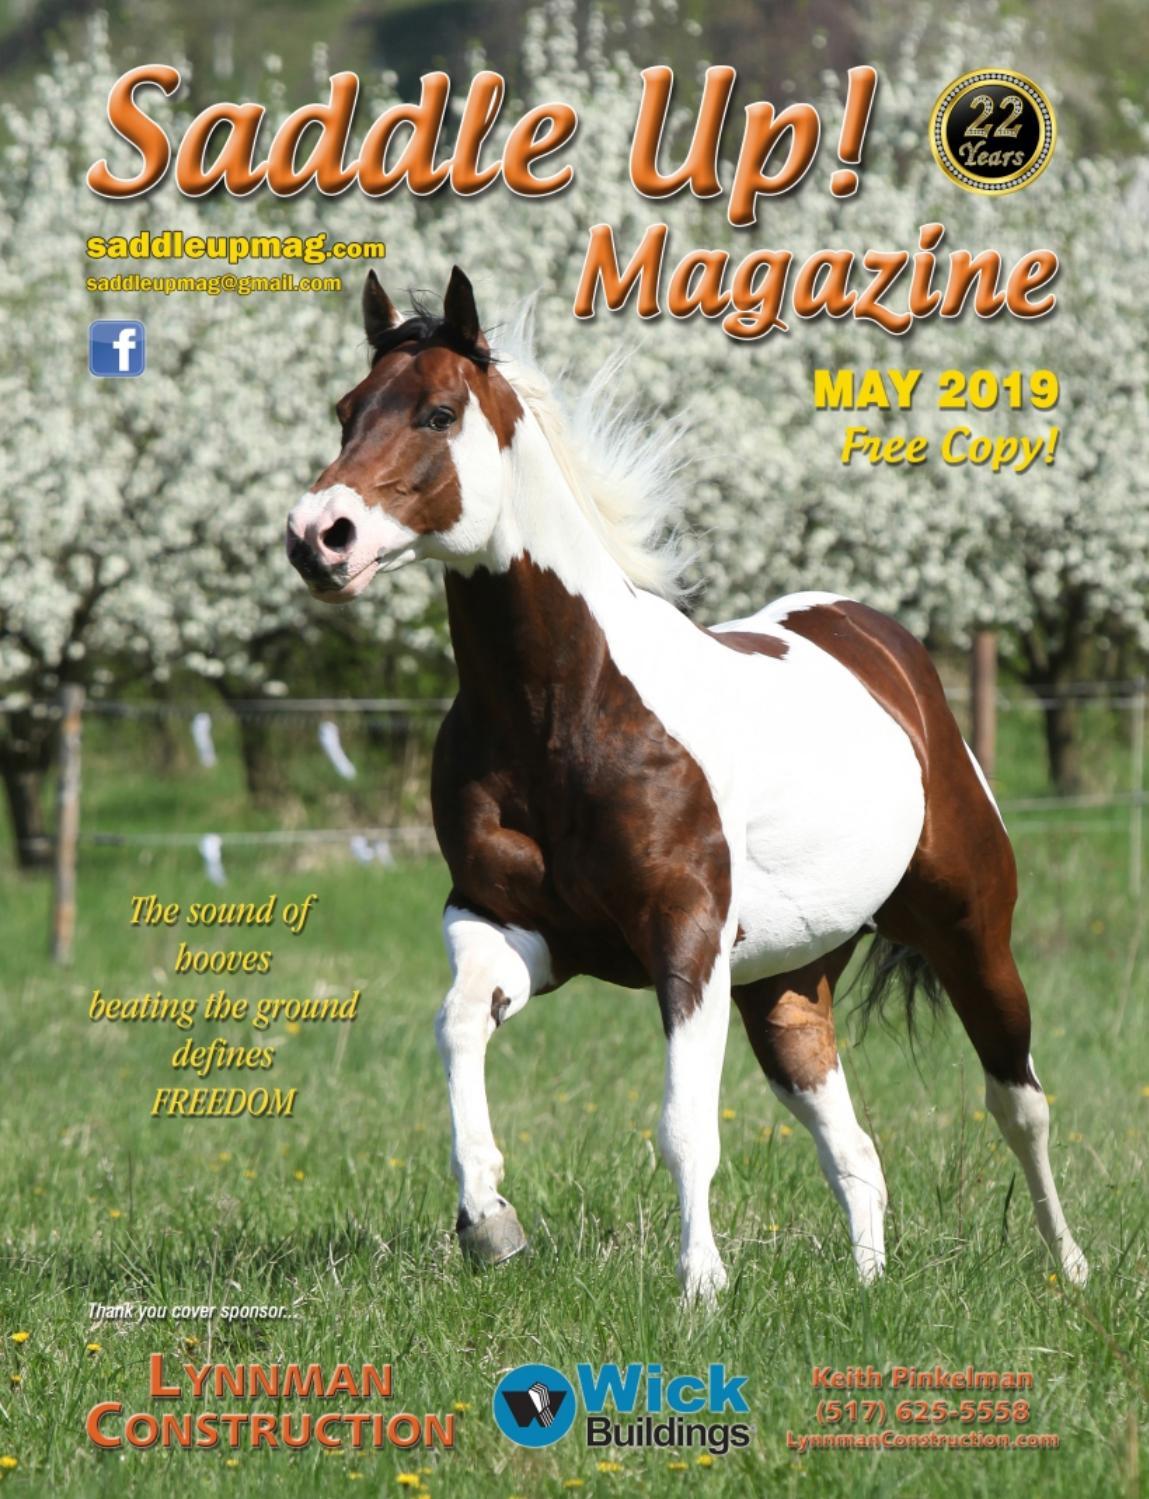 NEW! Carlisle Wood Handle Full English Horse Grooming Curry Brush Box of 12